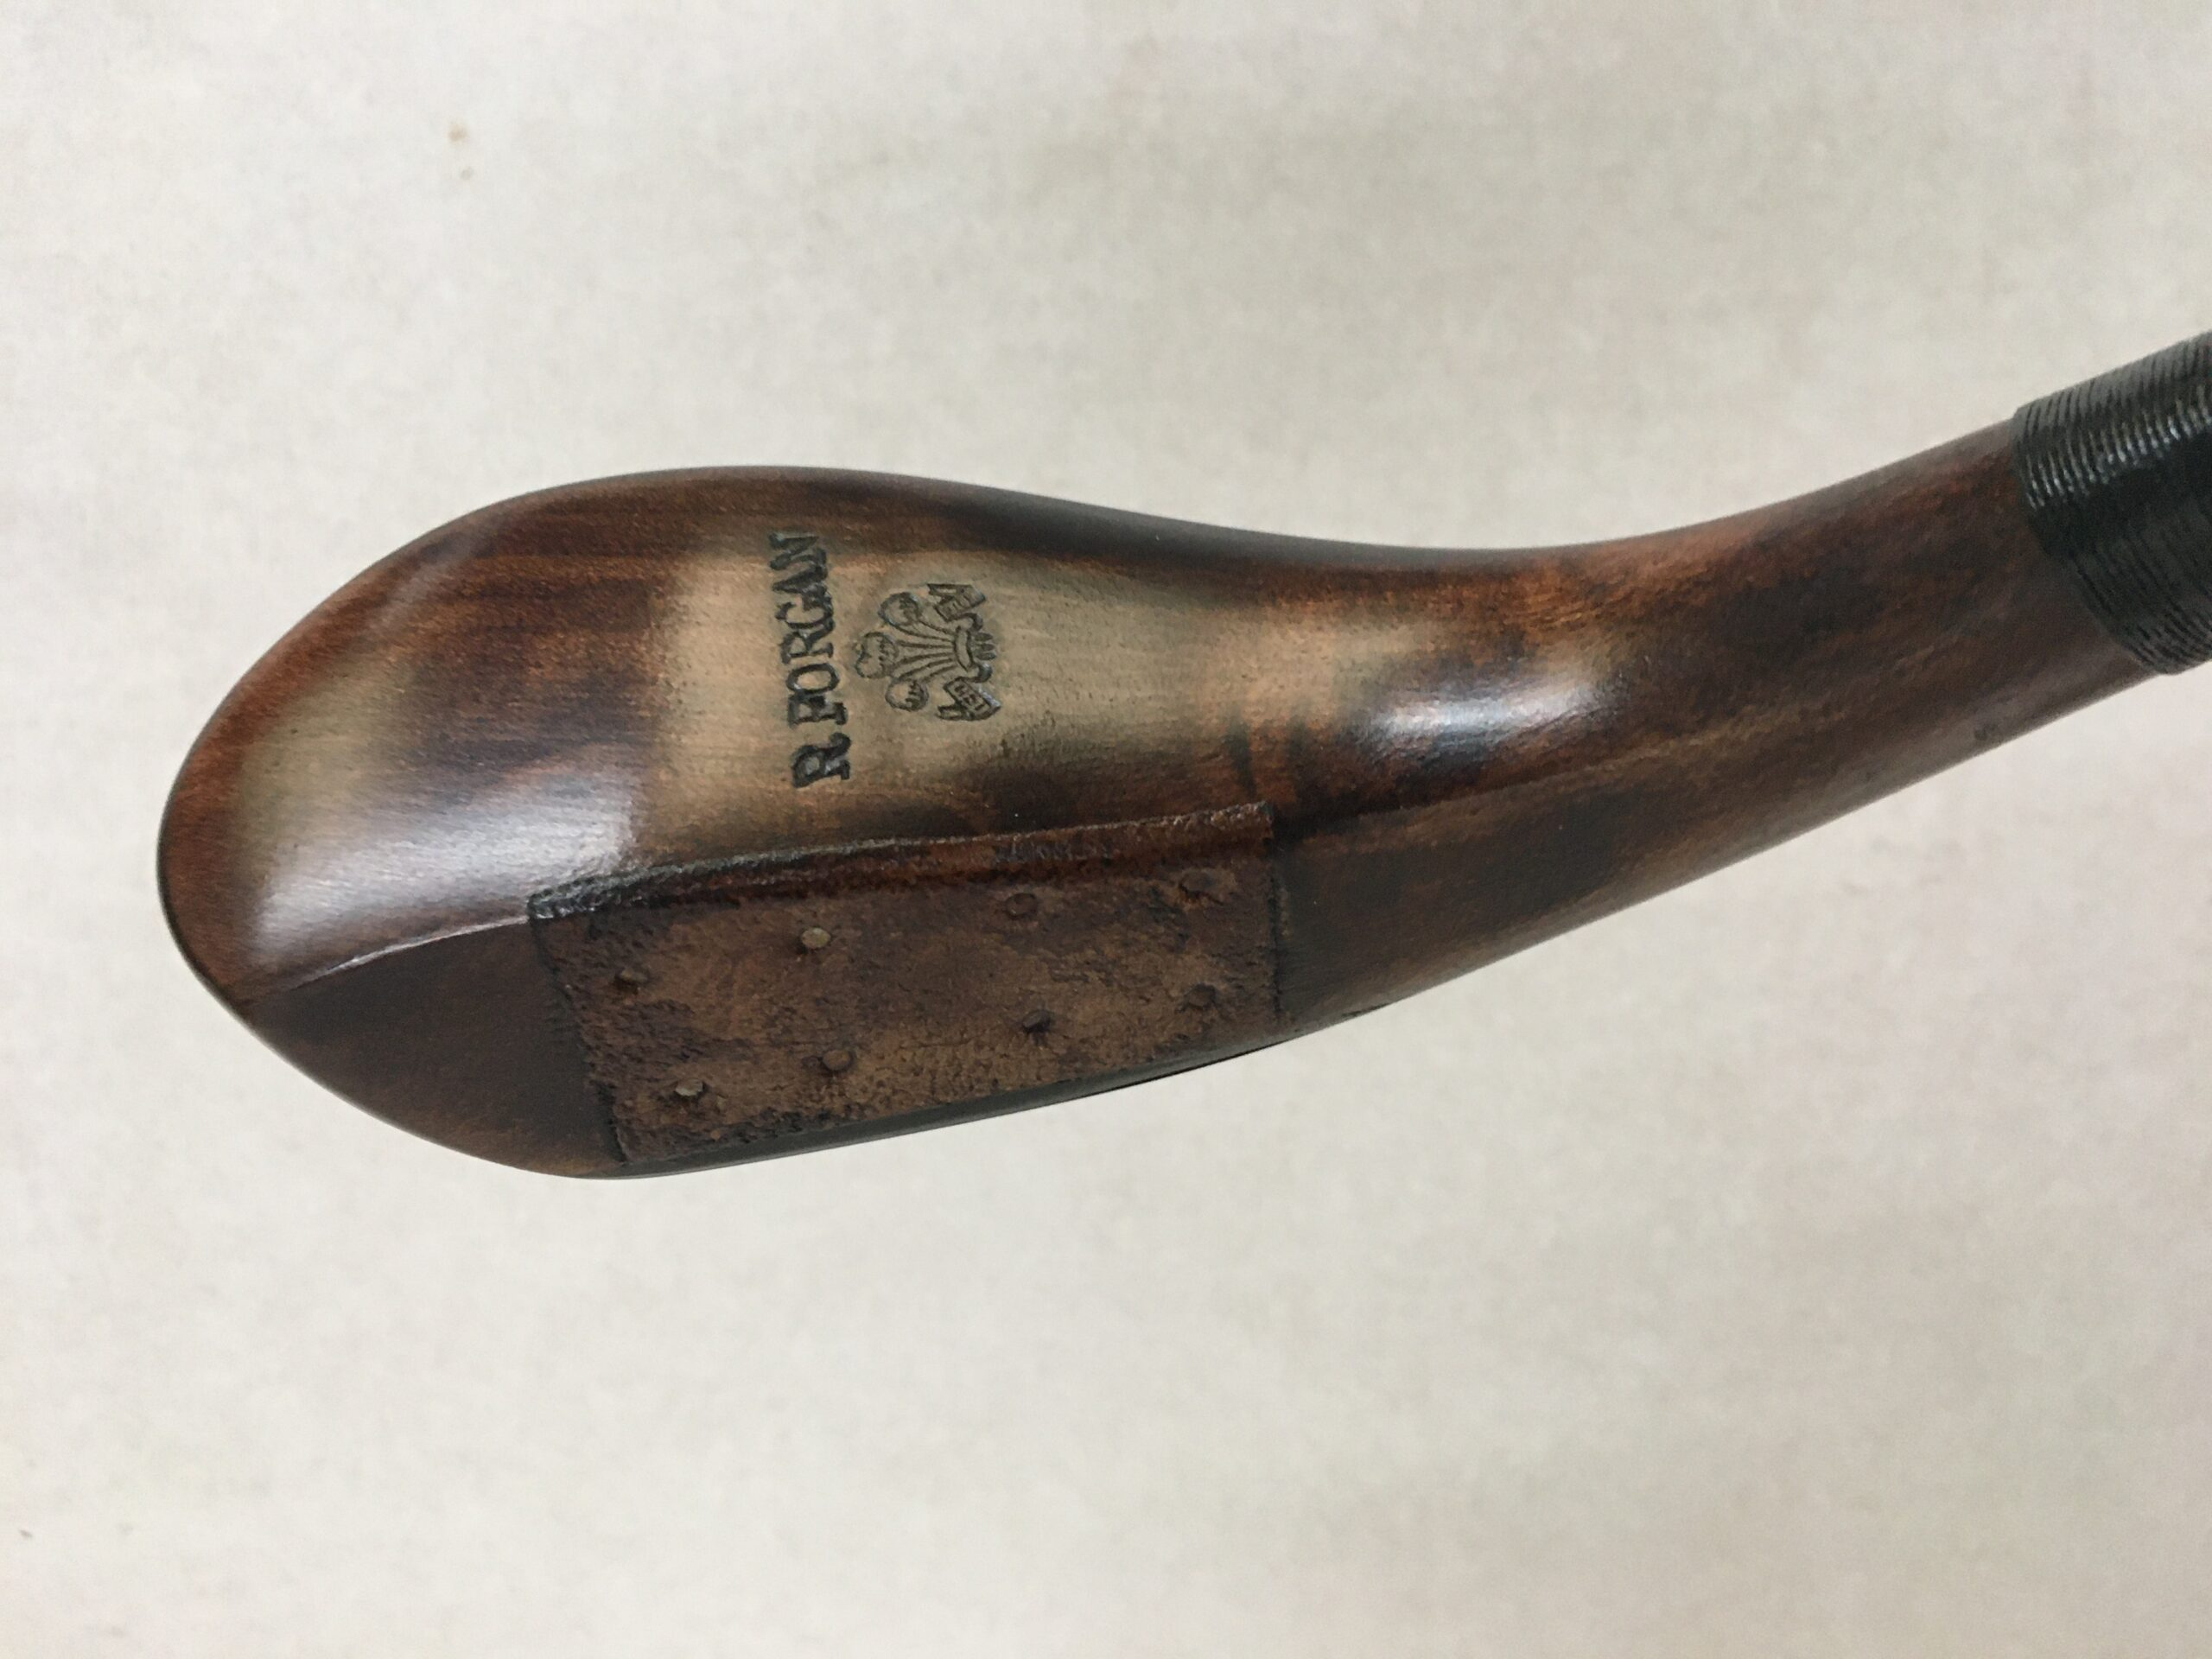 Robert Forgan Baffing spoon replica